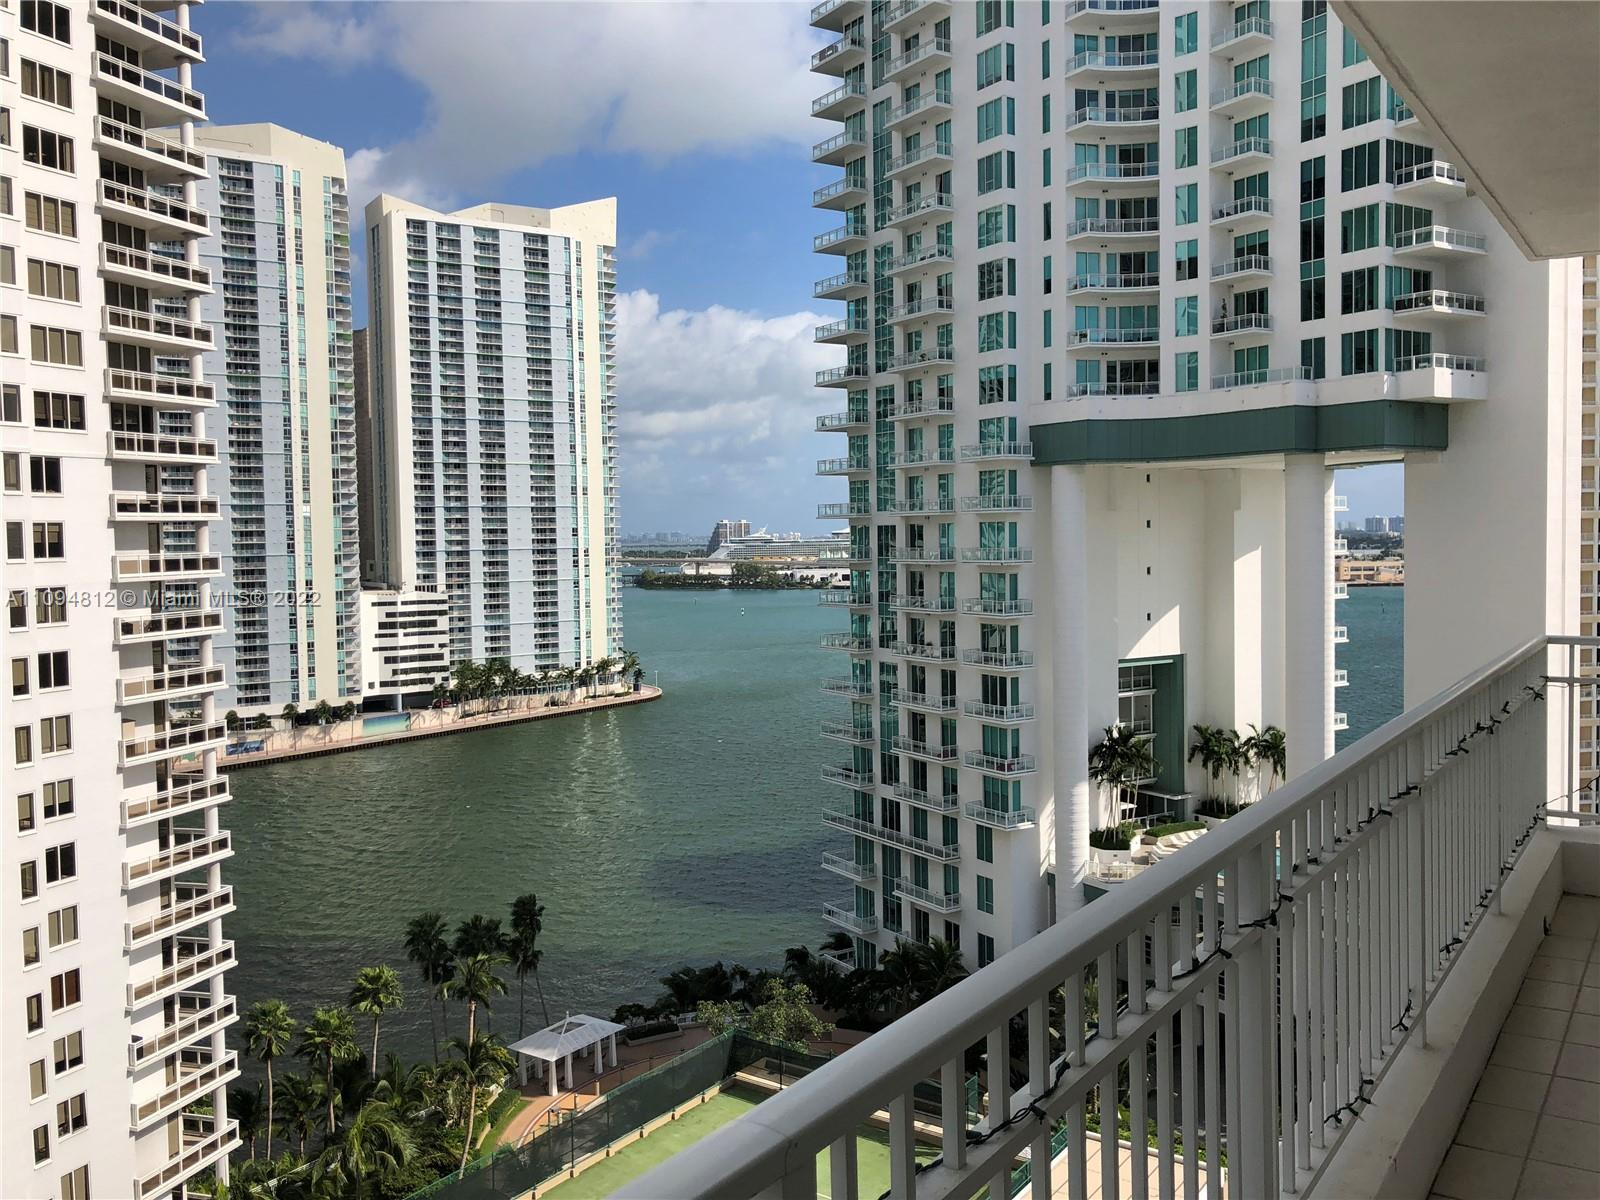 Courts Brickell Key #1610 - 801 Brickell Key Blvd #1610, Miami, FL 33131